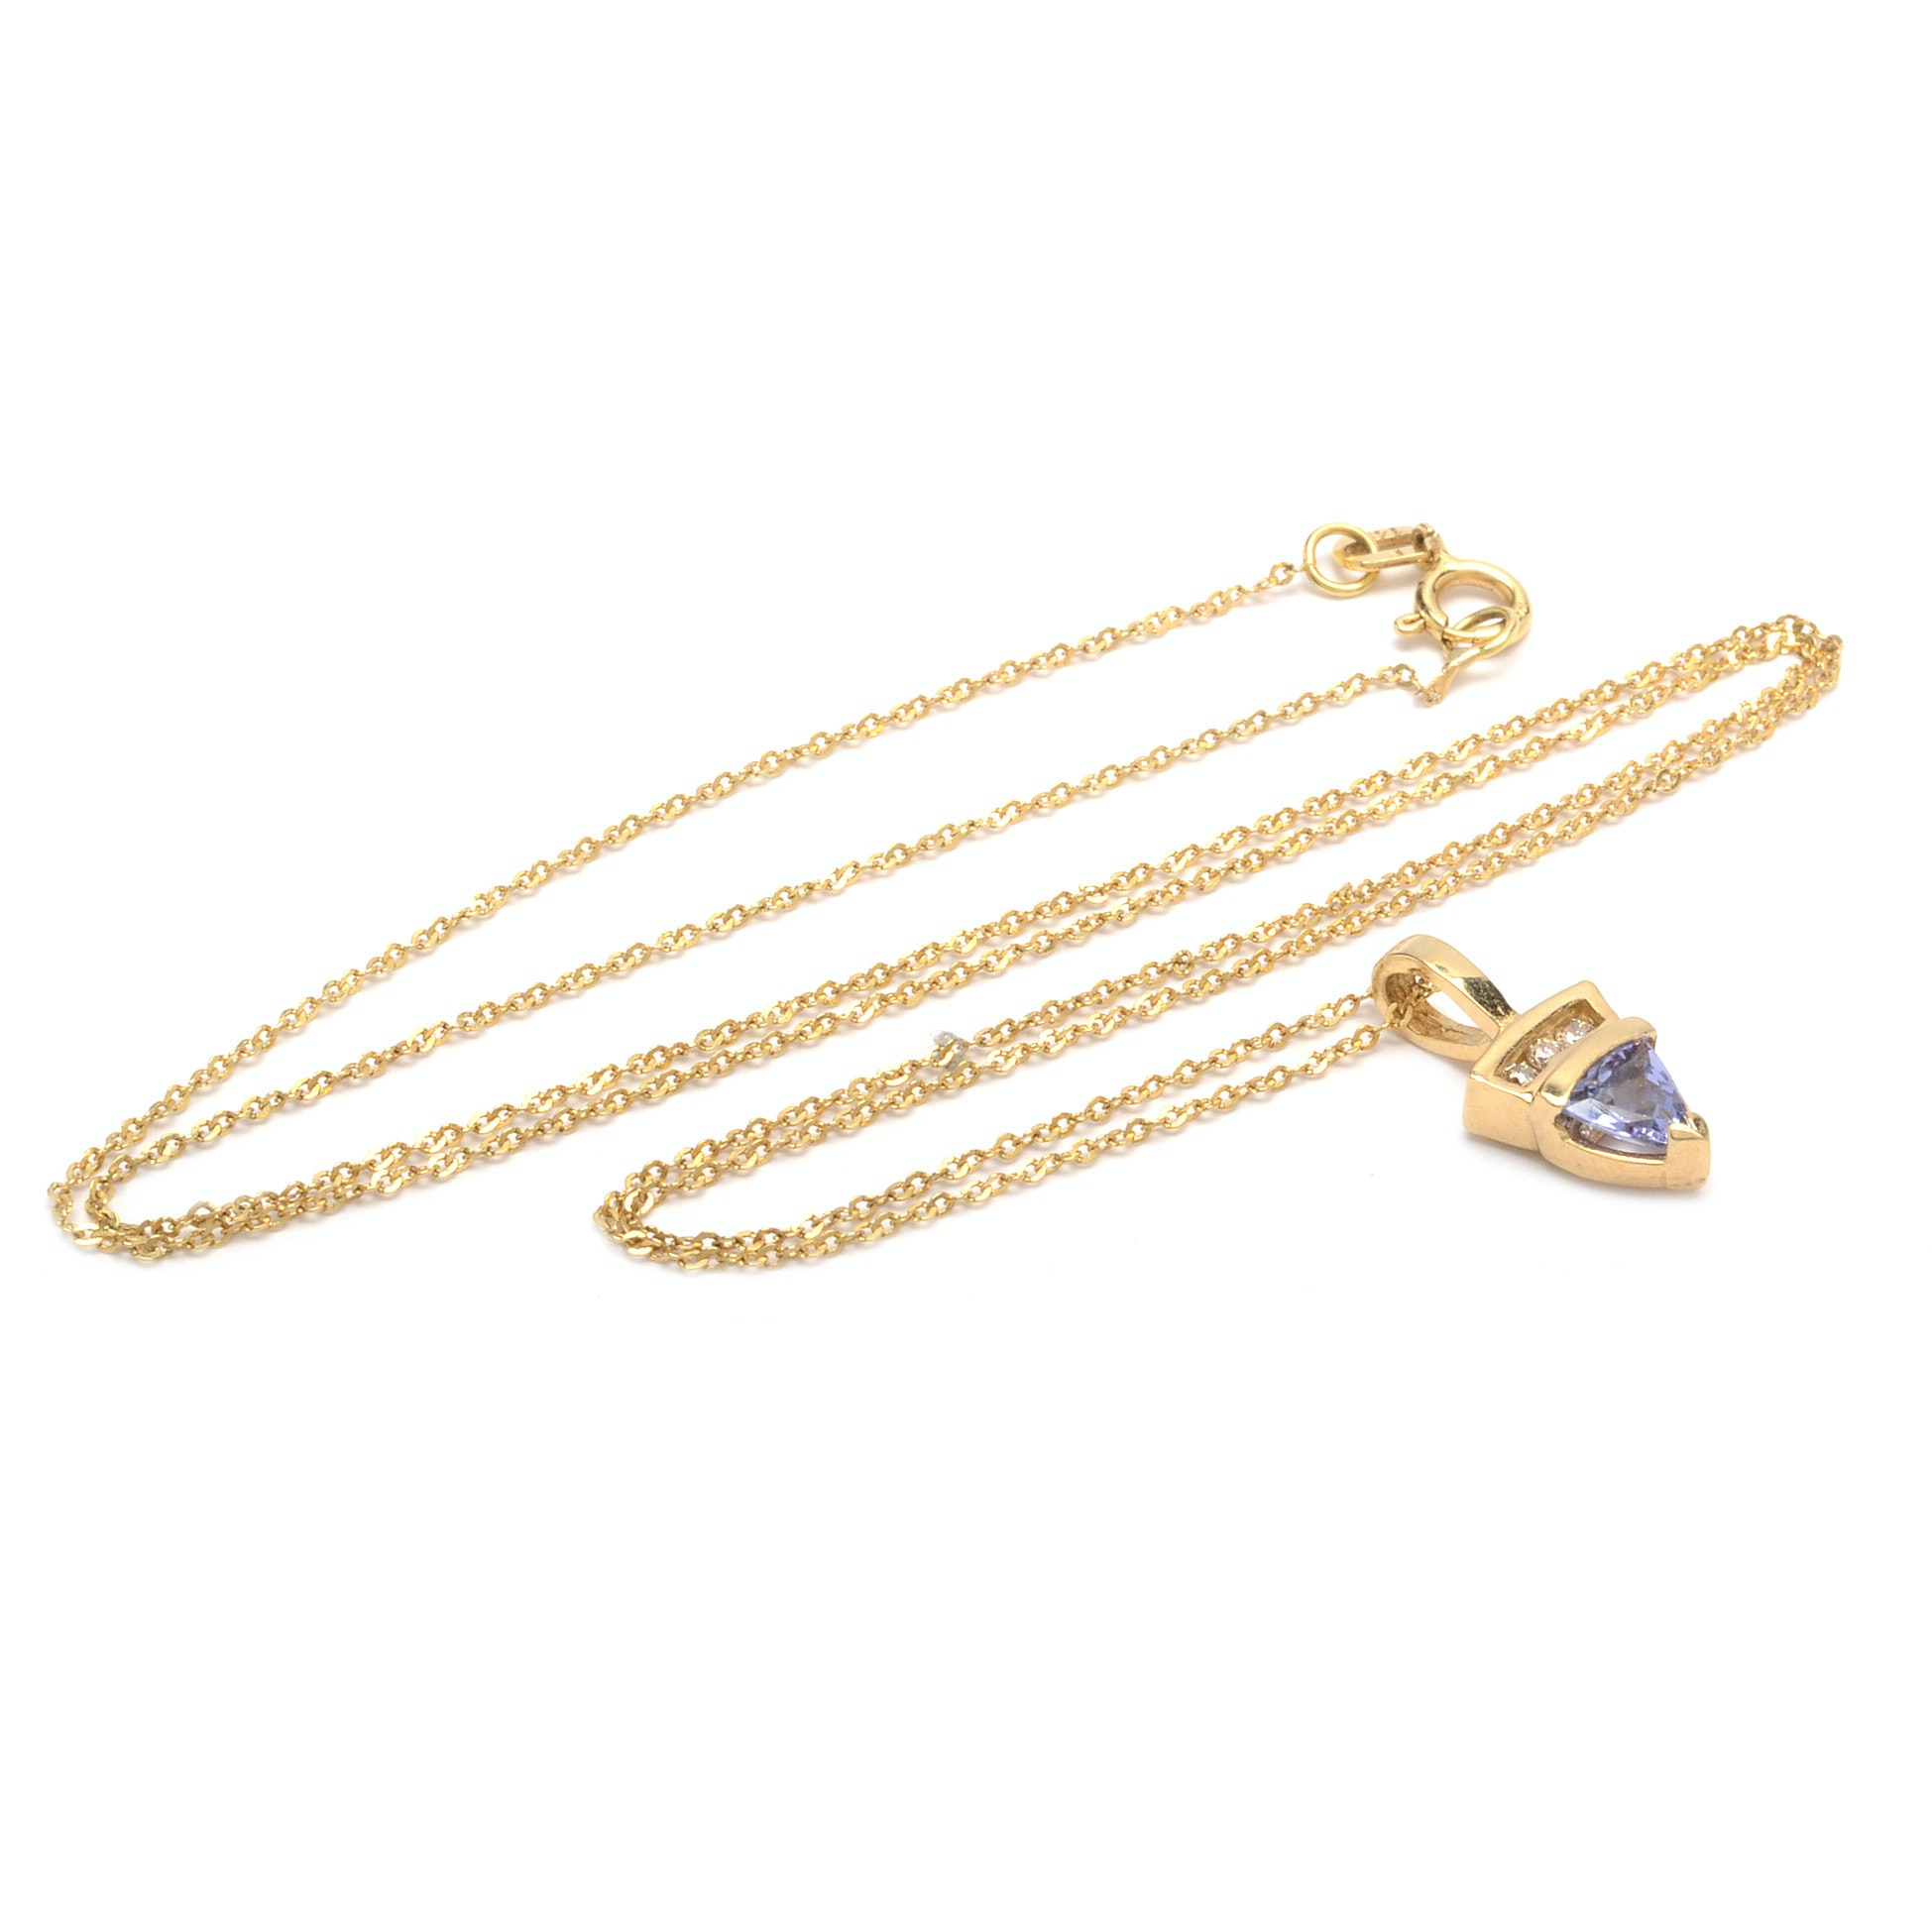 10K/14K Yellow Gold Tanzanite and Diamond Pendant Necklace